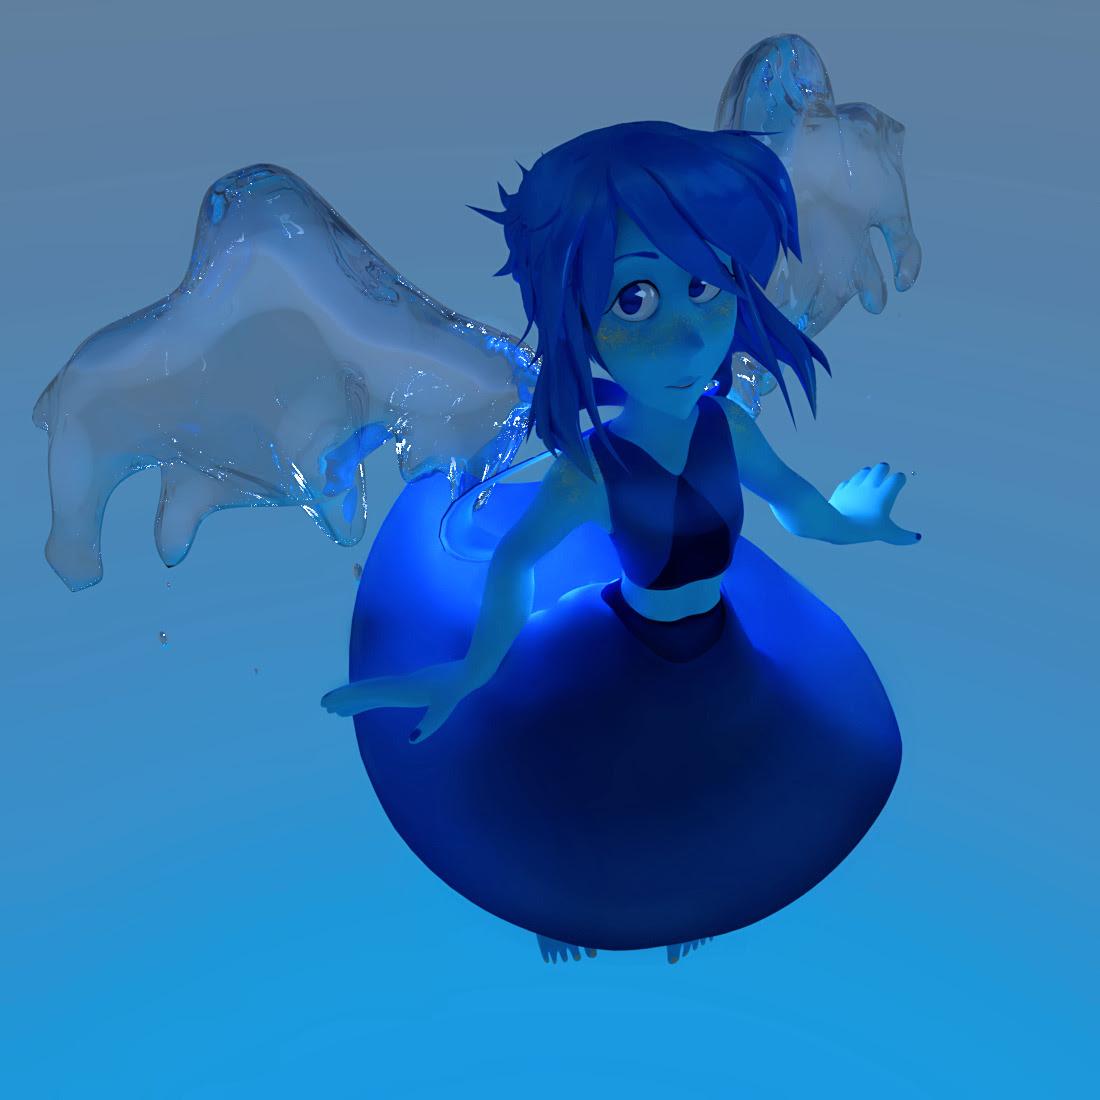 So, here's Lapis. I hope wings look like it's water.